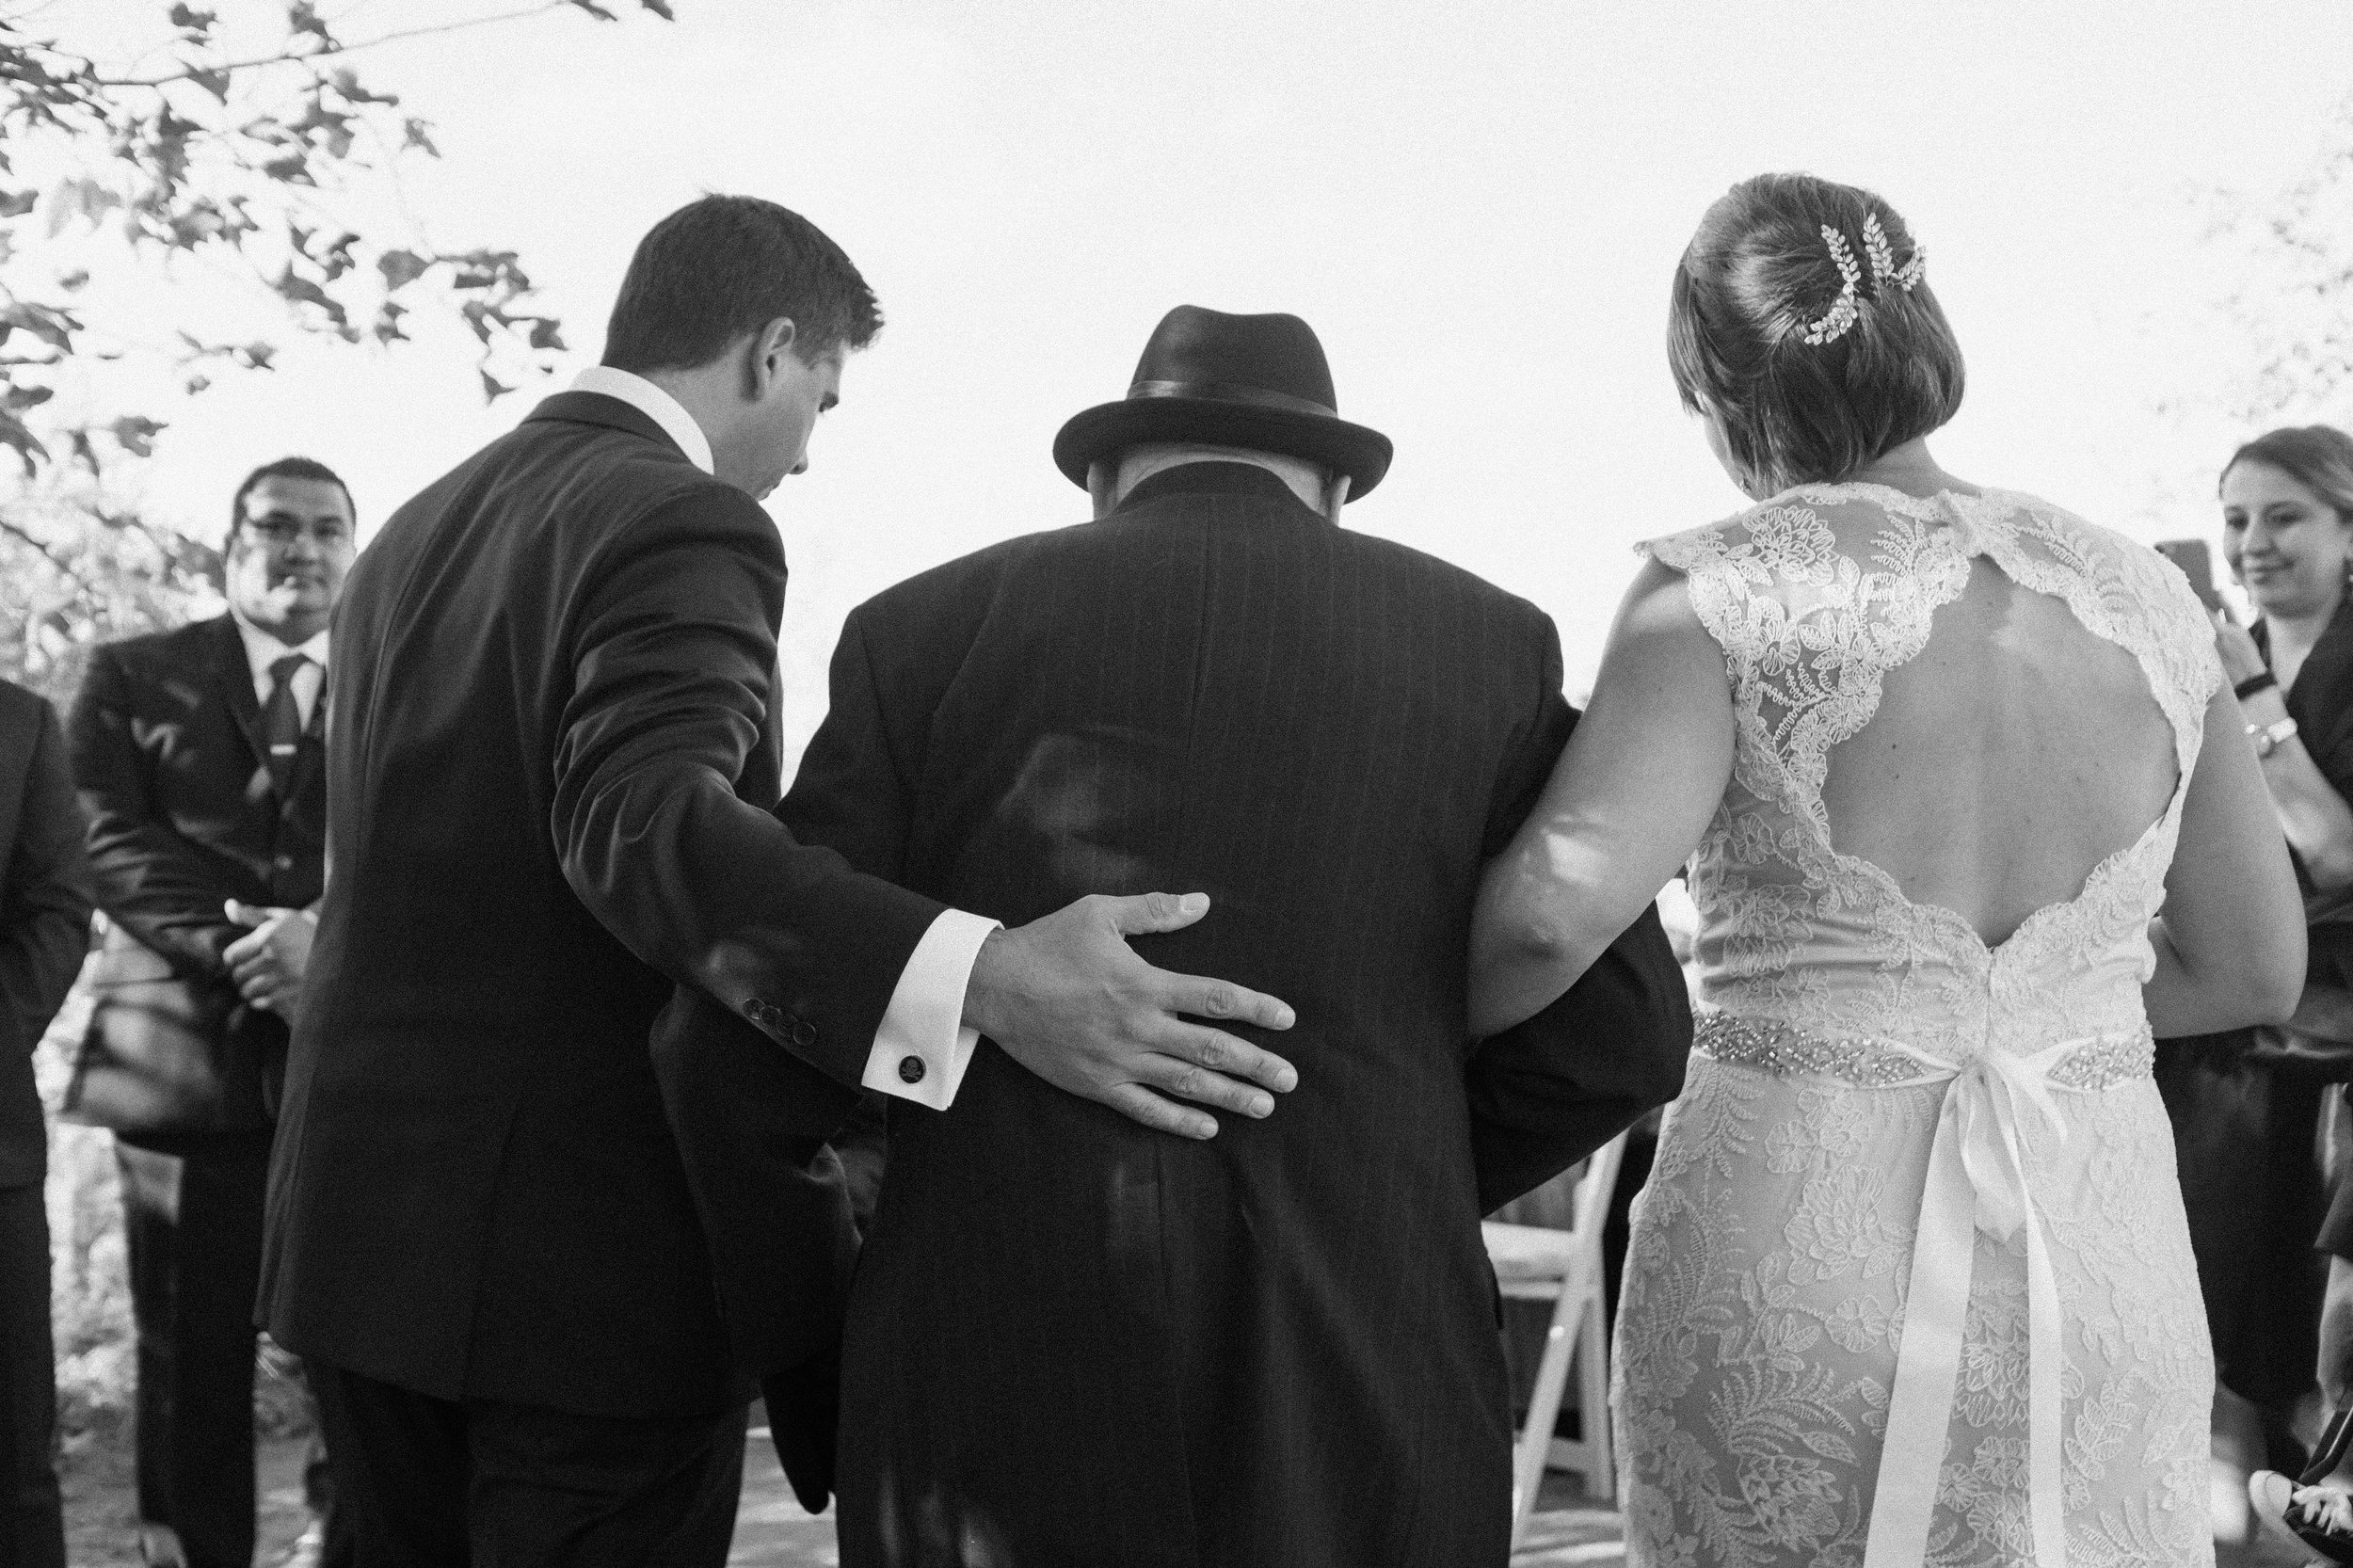 baldwin hills scenic overlook culver city los angeles wedding photographer documentary candid13.JPG